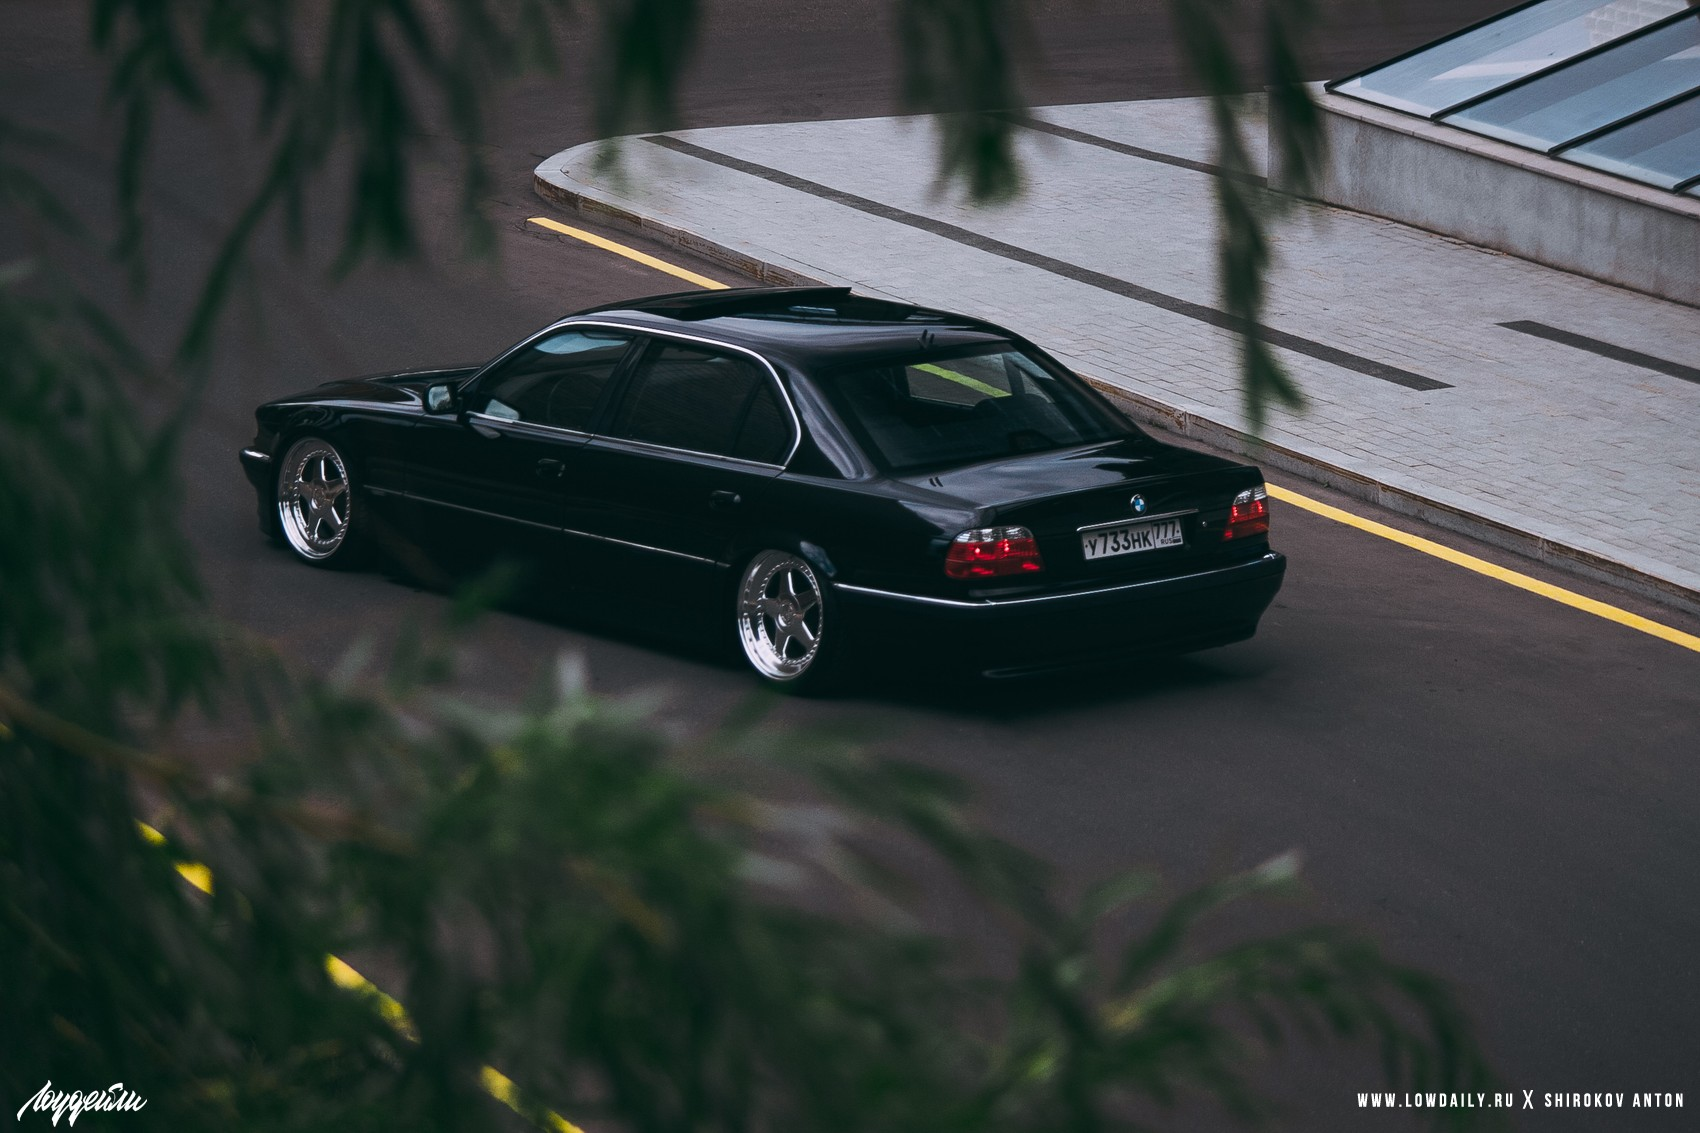 BMW E38 Lowdaily _MG_6987